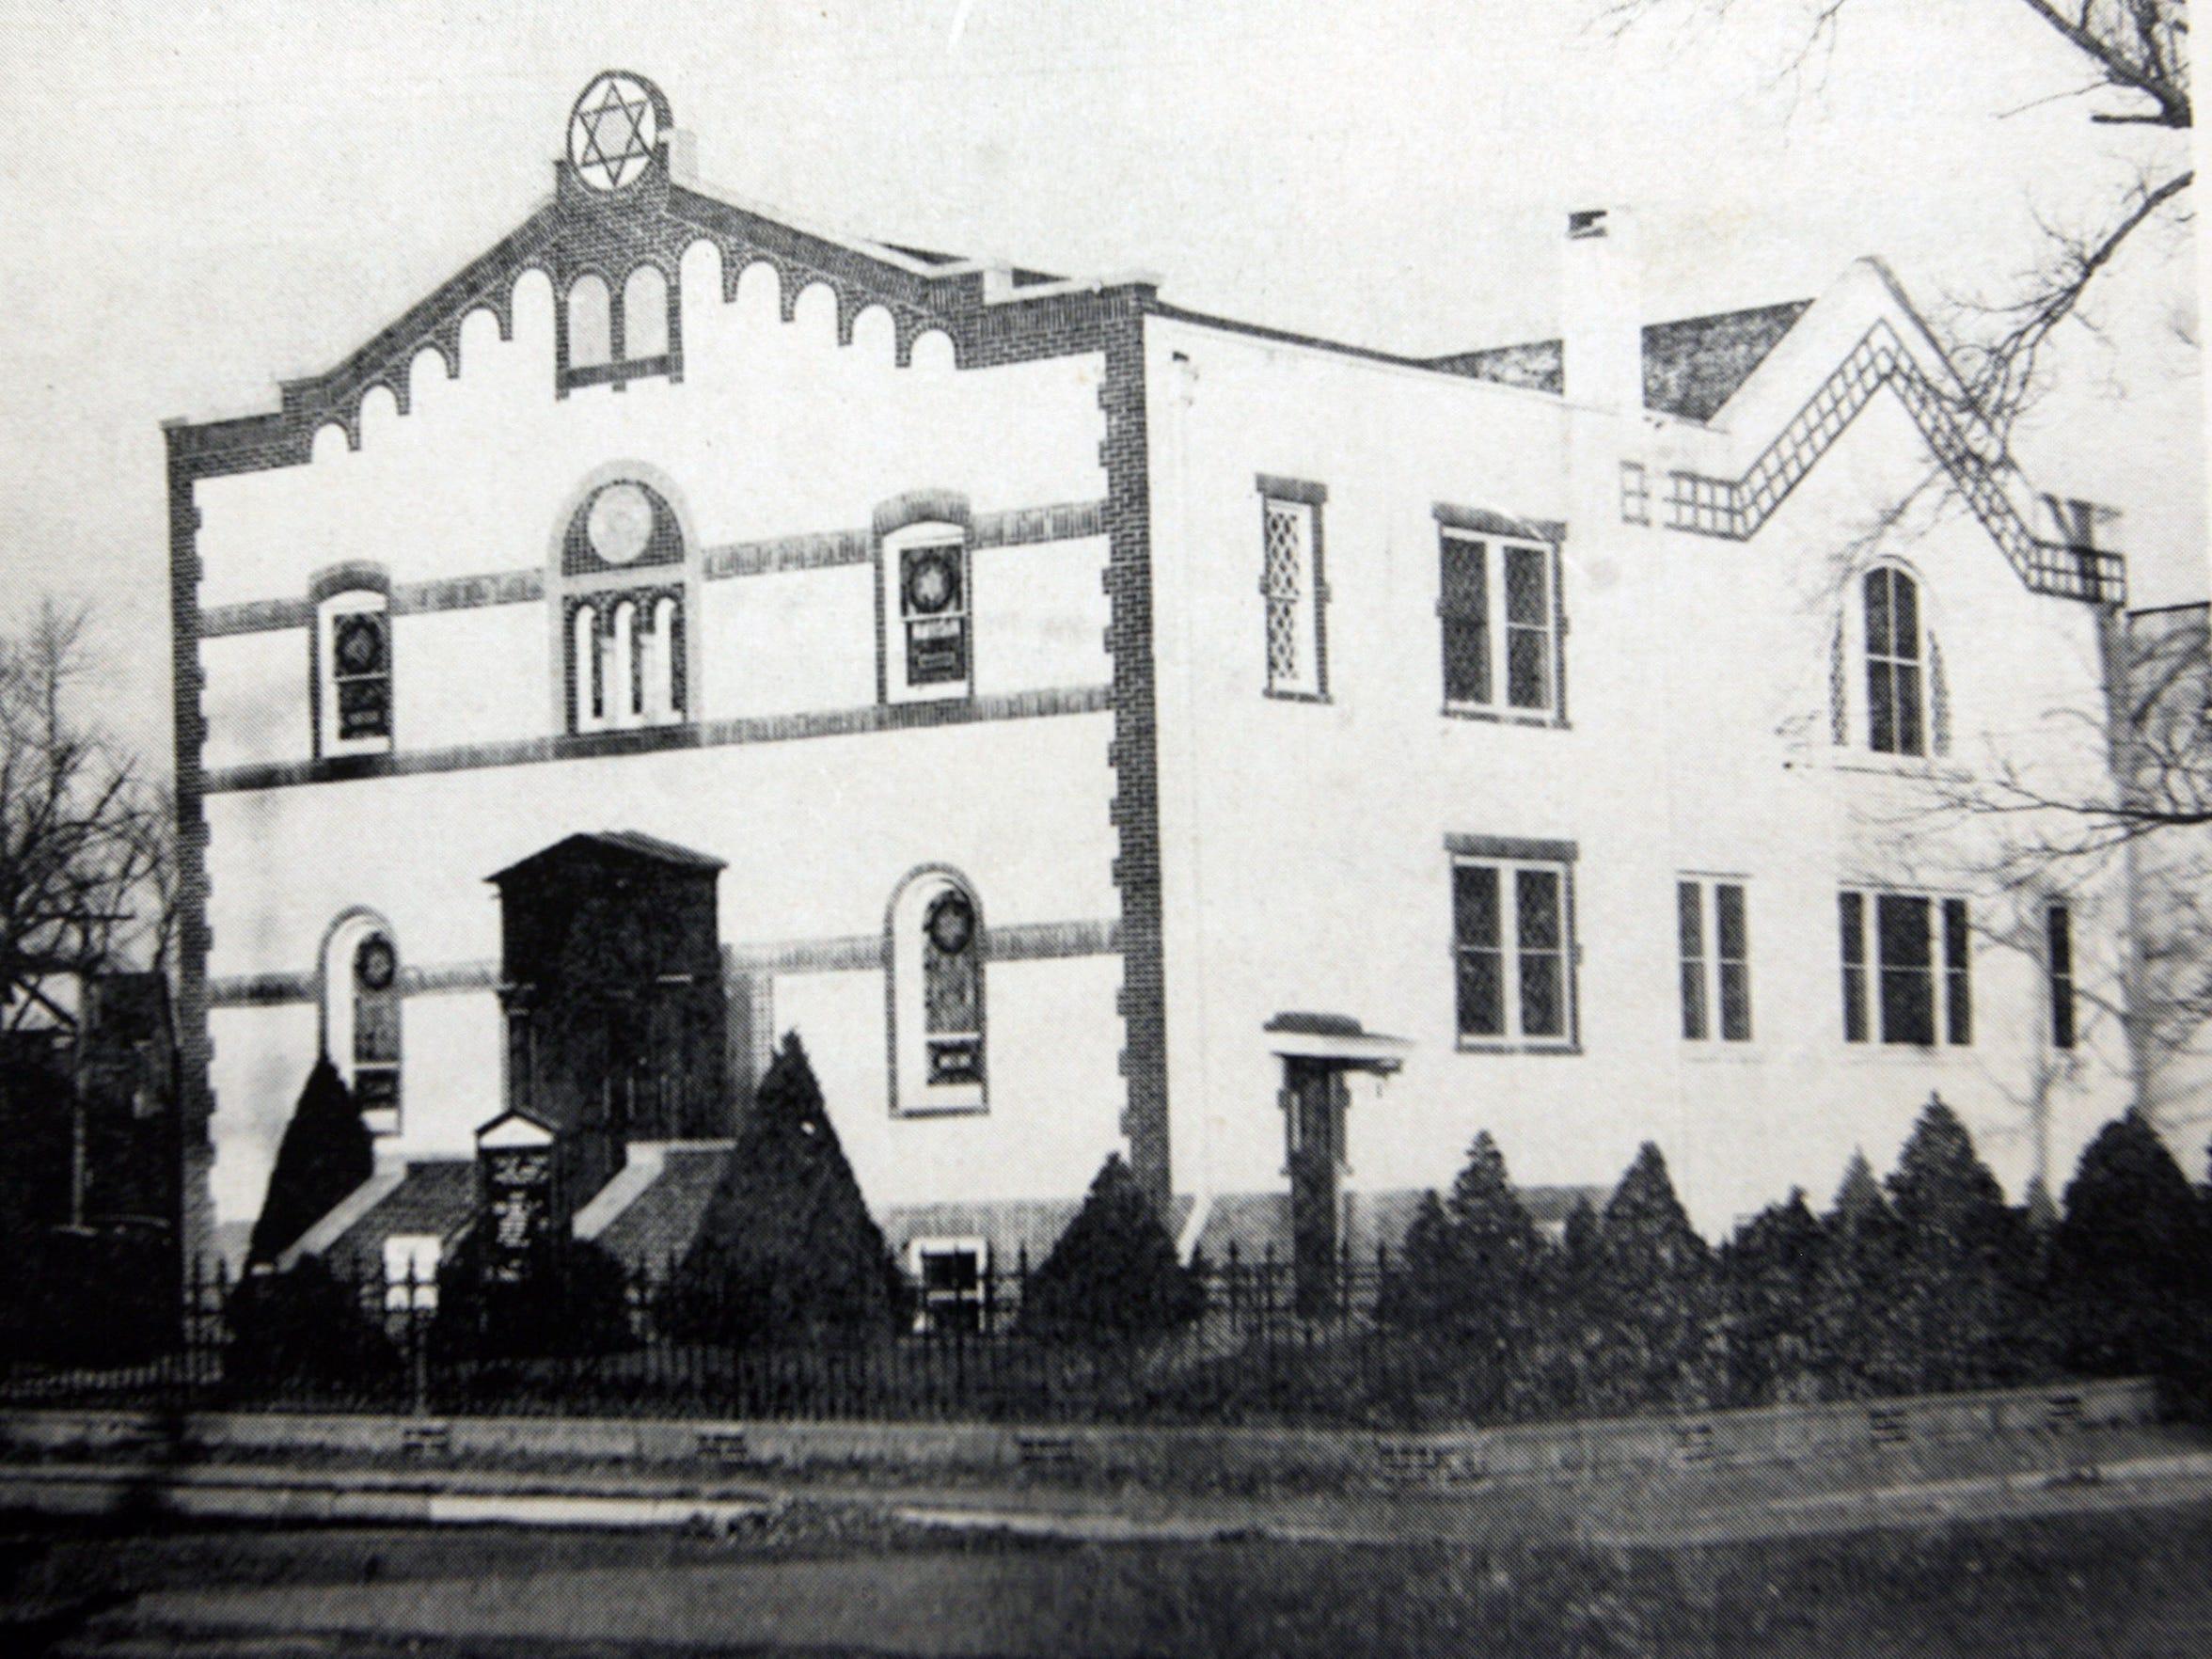 First Orthodox Synagogue, Lakewood, N.J. Circa 1950's.